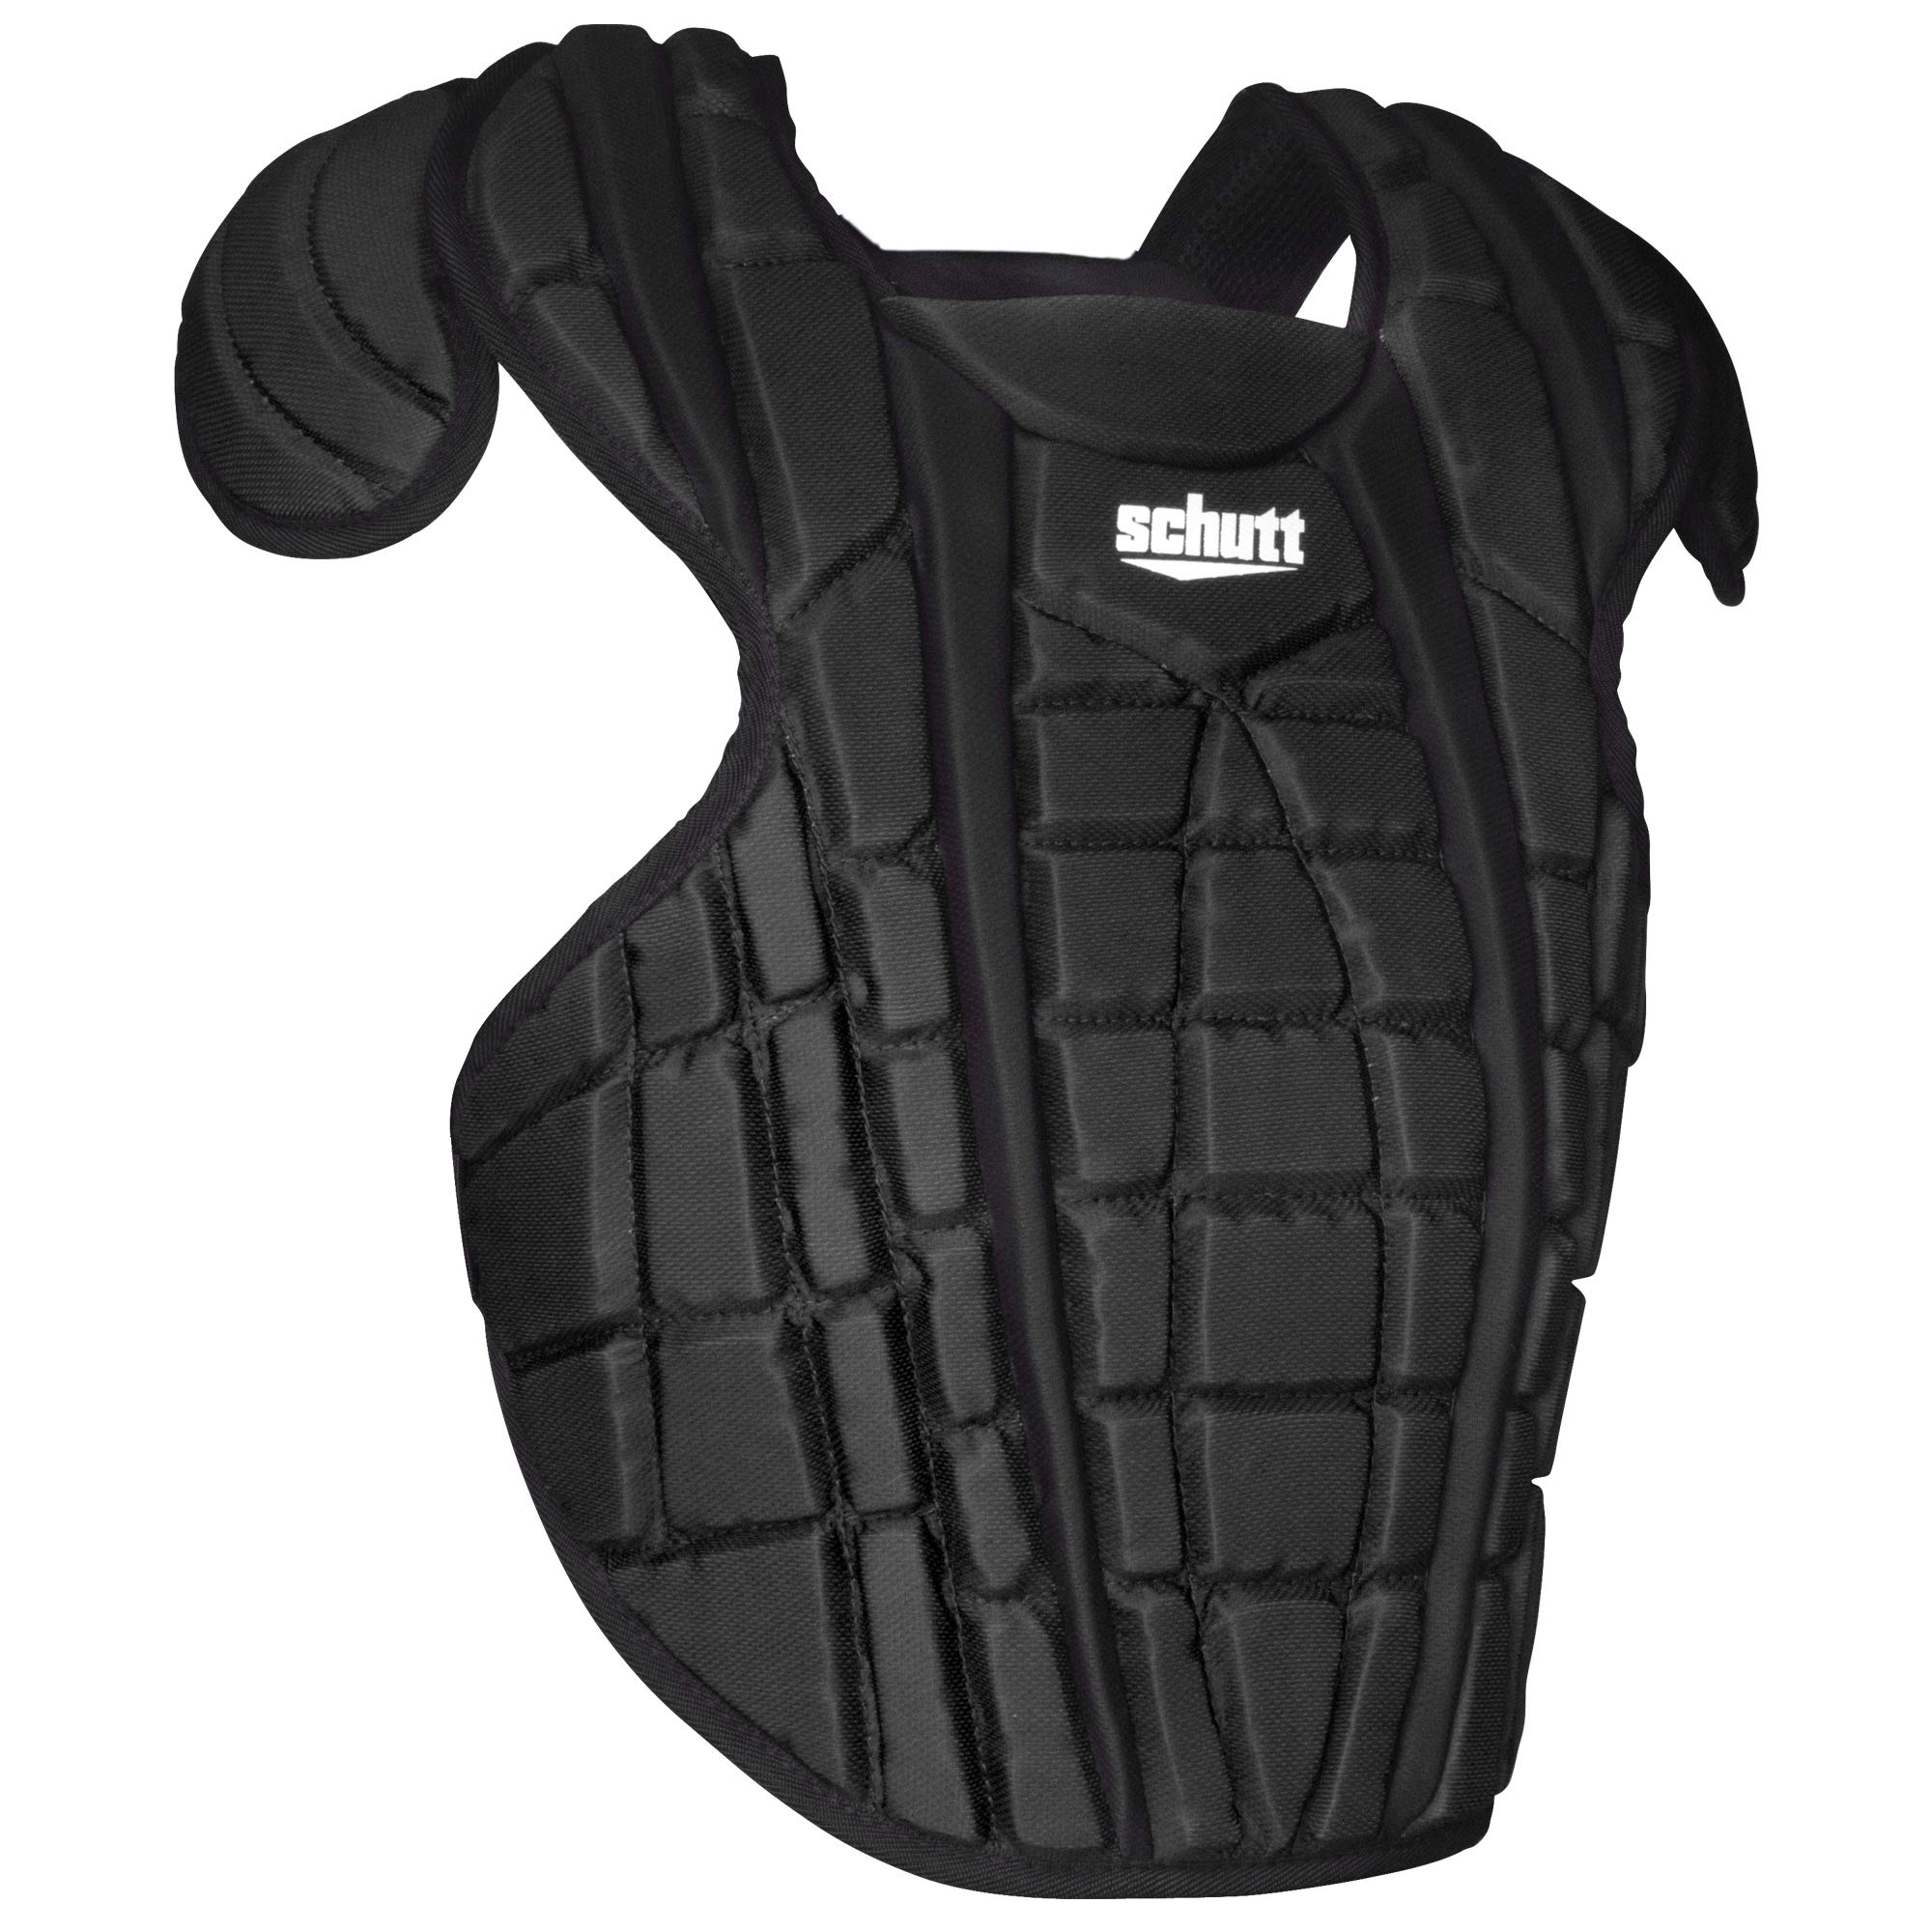 Schutt Sports Scorpion 2.0 Catcher's Chest Protector, Black, 16'' by Schutt